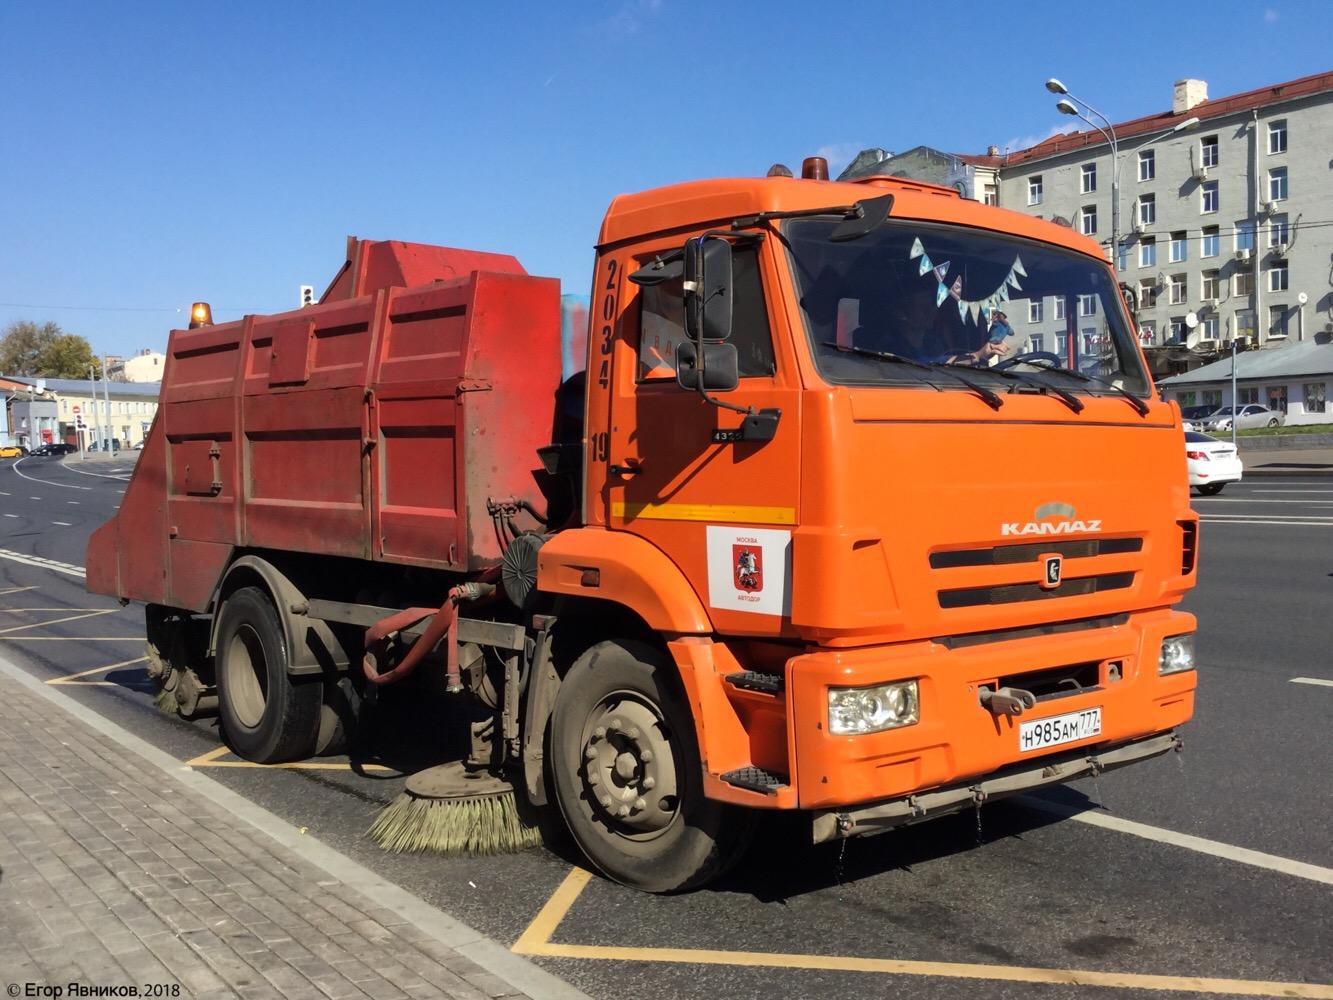 Подметально-уборочная машина ПУМ-77.3 на шасси КамАЗ-43253, #н985ам777. г. Москва